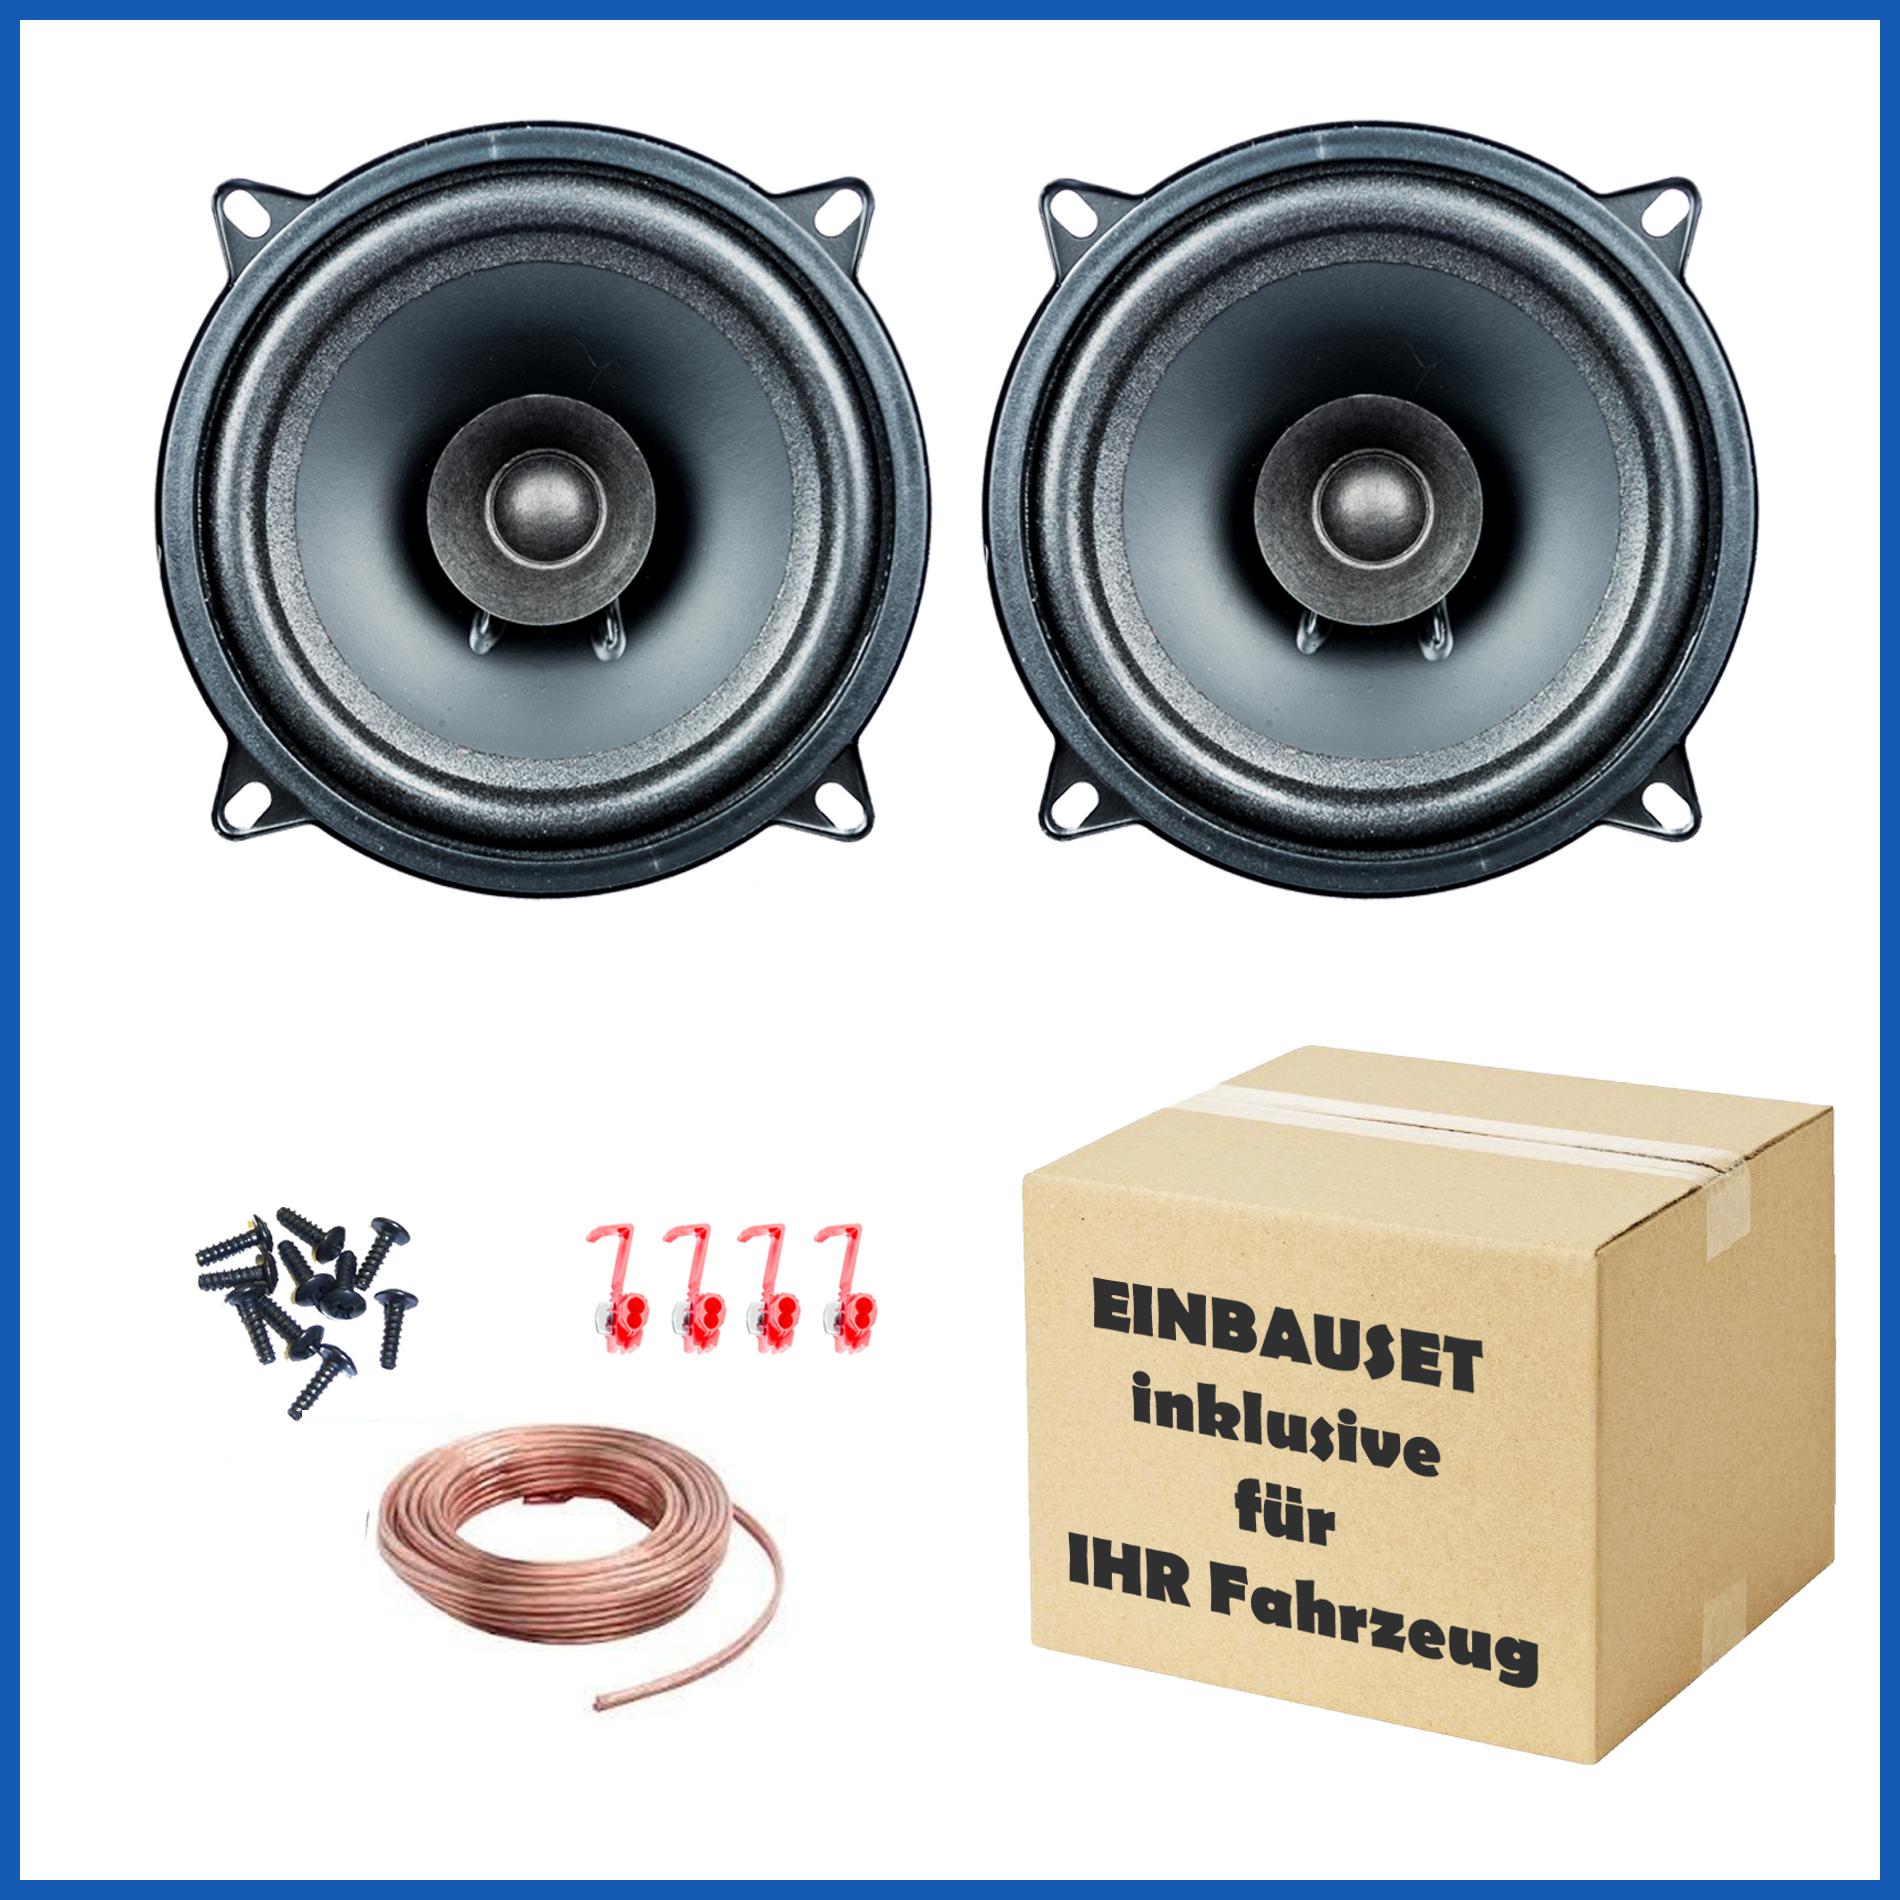 1 Paar PG Audio EVO I 13.2, 13 cm Dual Cone Lautsprecher passend für Chevrolet, Daihatsu, Honda, Mazda & Nissan 001